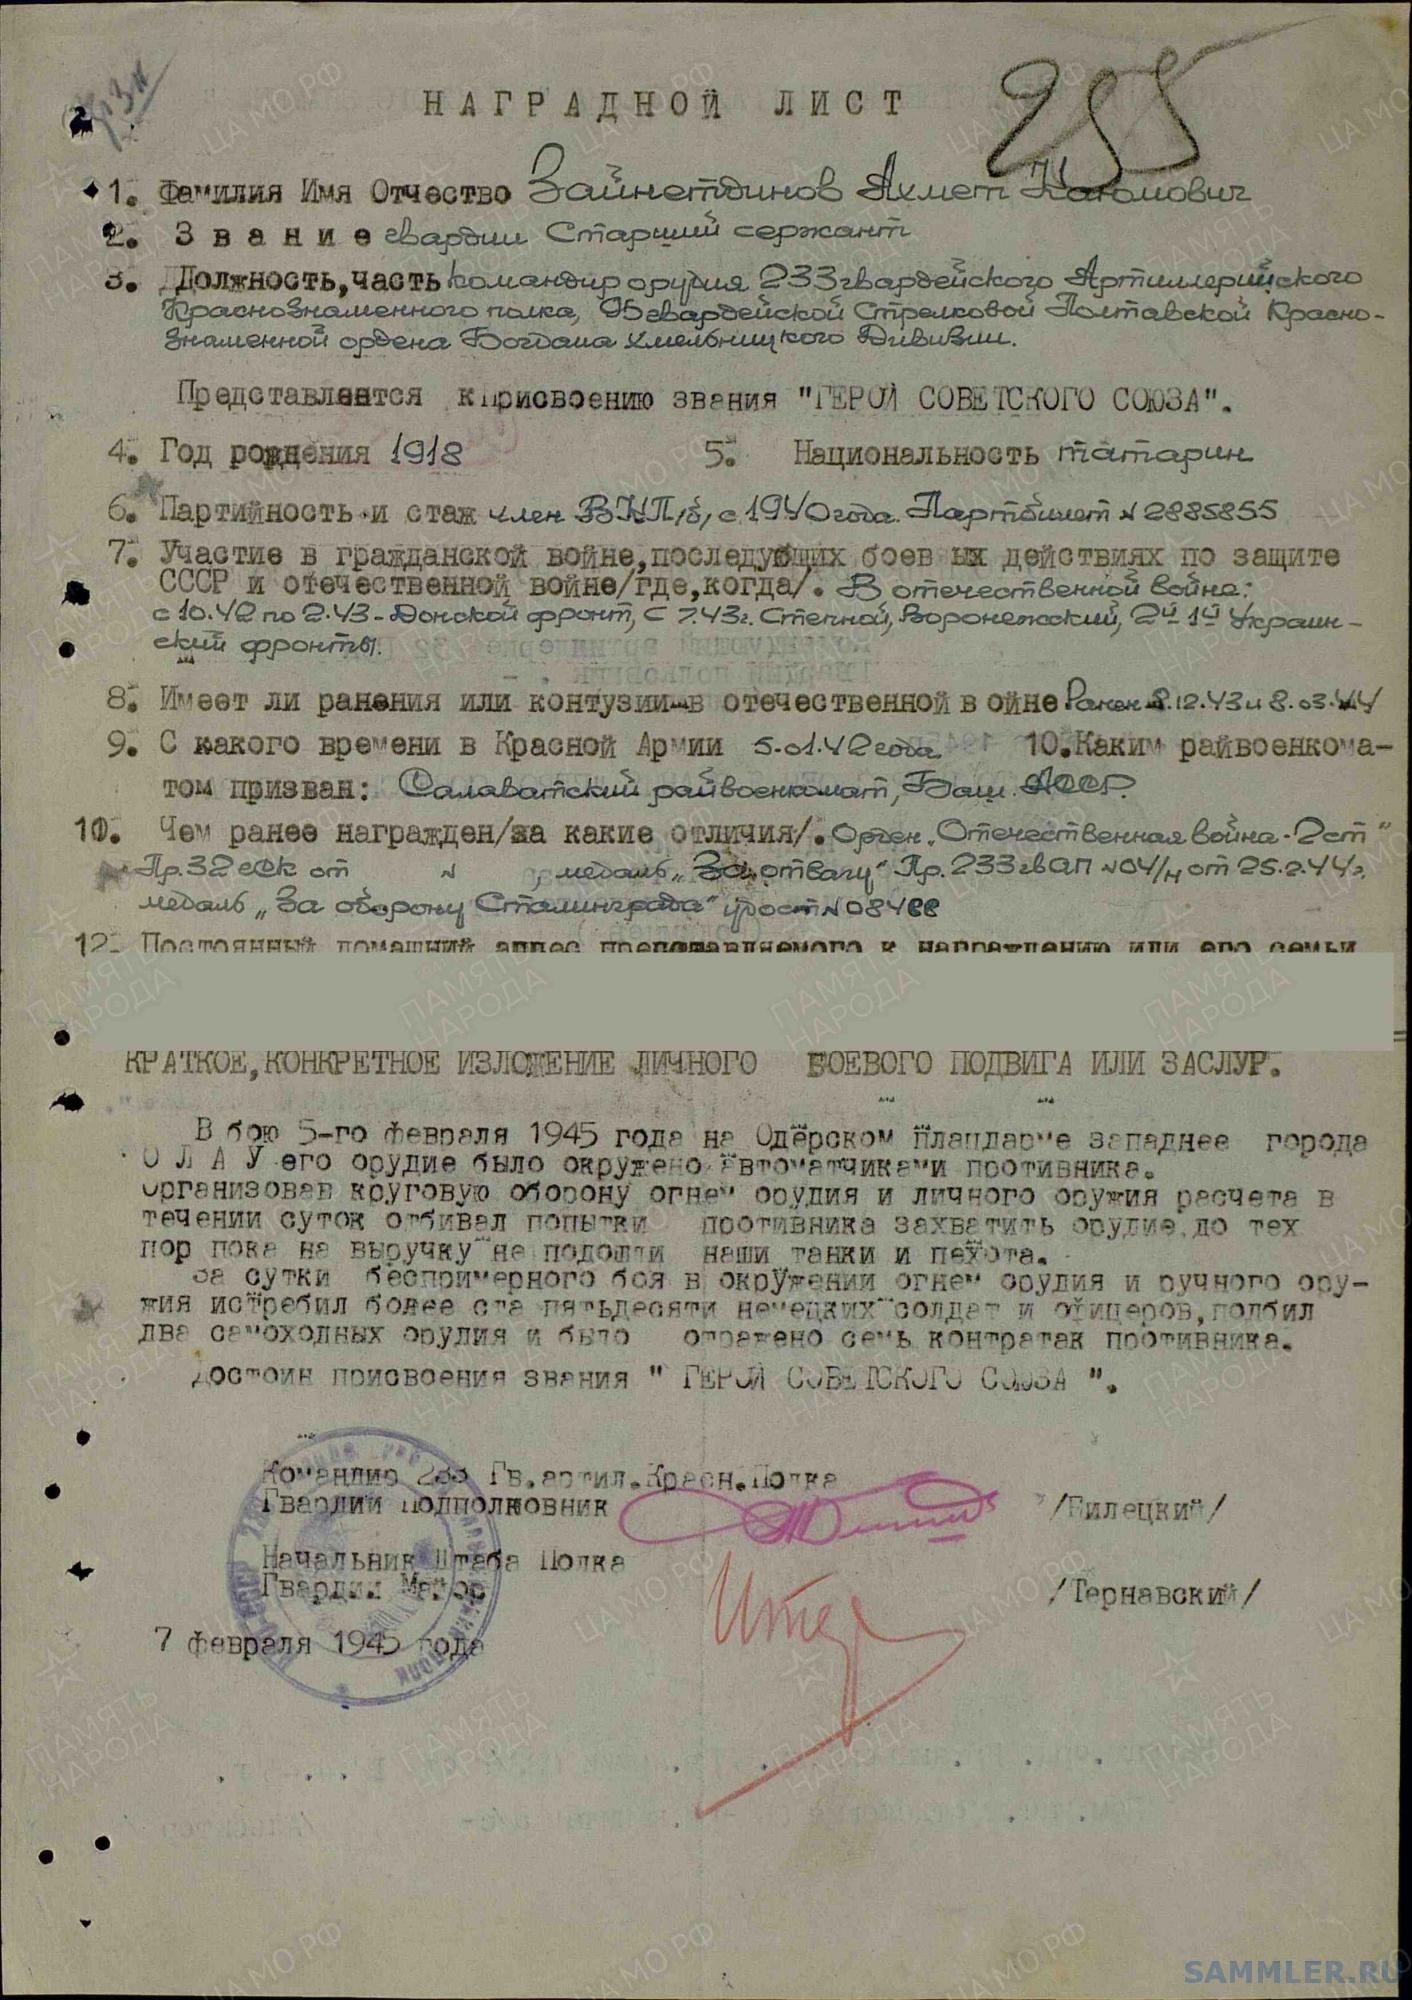 Зайнетдинов Ахмет Каюмович.jpg